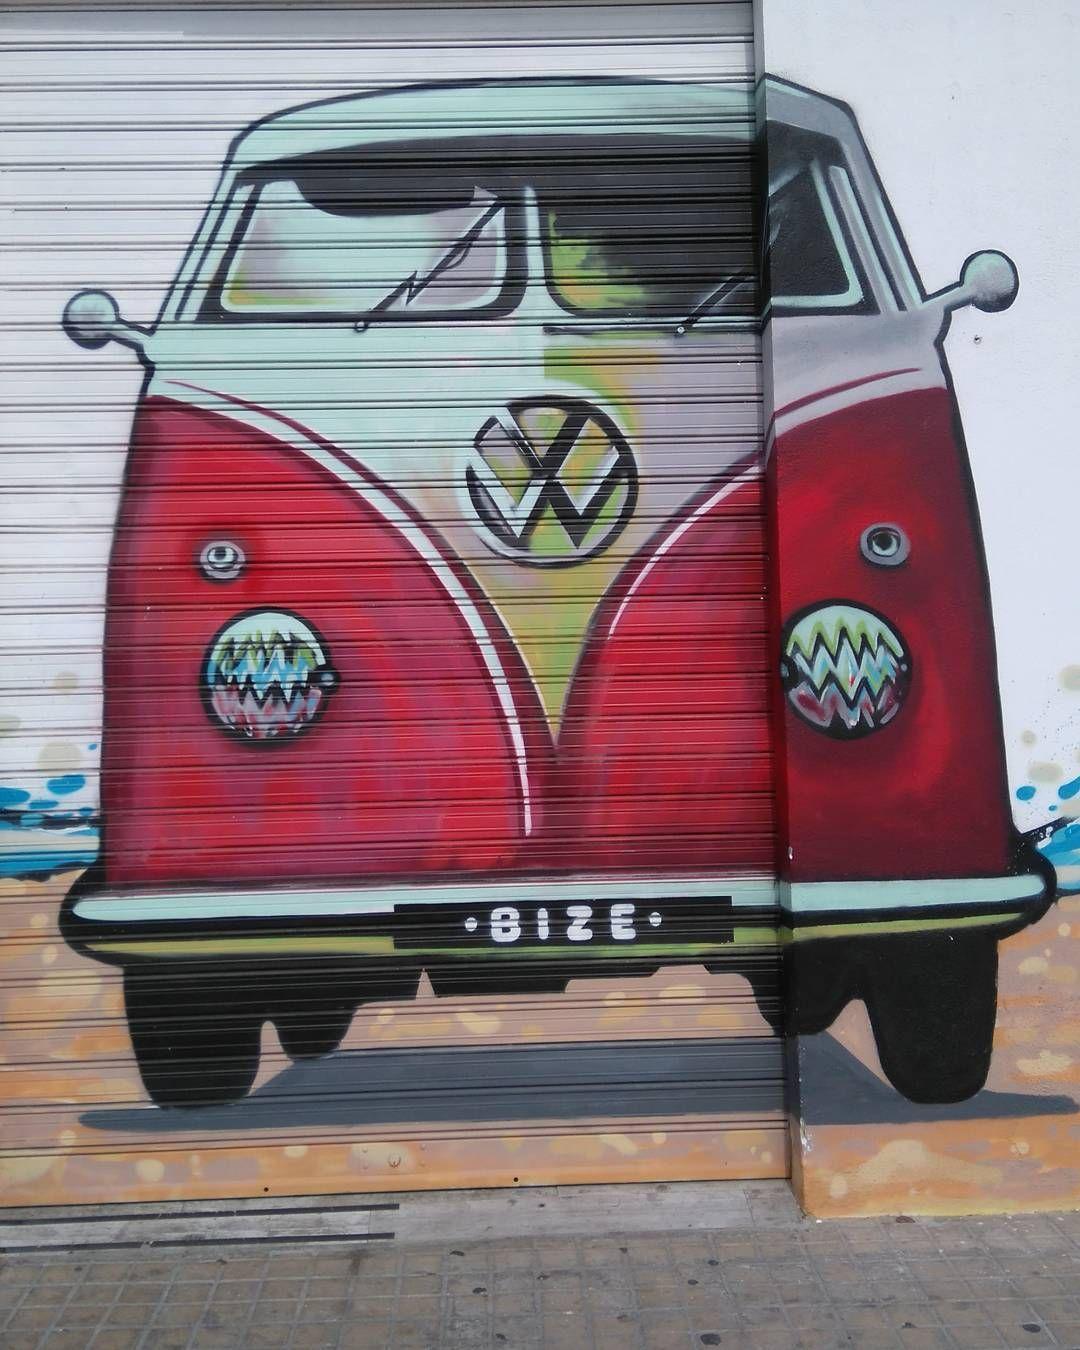 Check out our Surf clothing here! http://ift.tt/1T8lUJC It makes me wanna travel  #vans #streetart art #volkswagen #surf #travel #surflife #beachlife #beach #spain